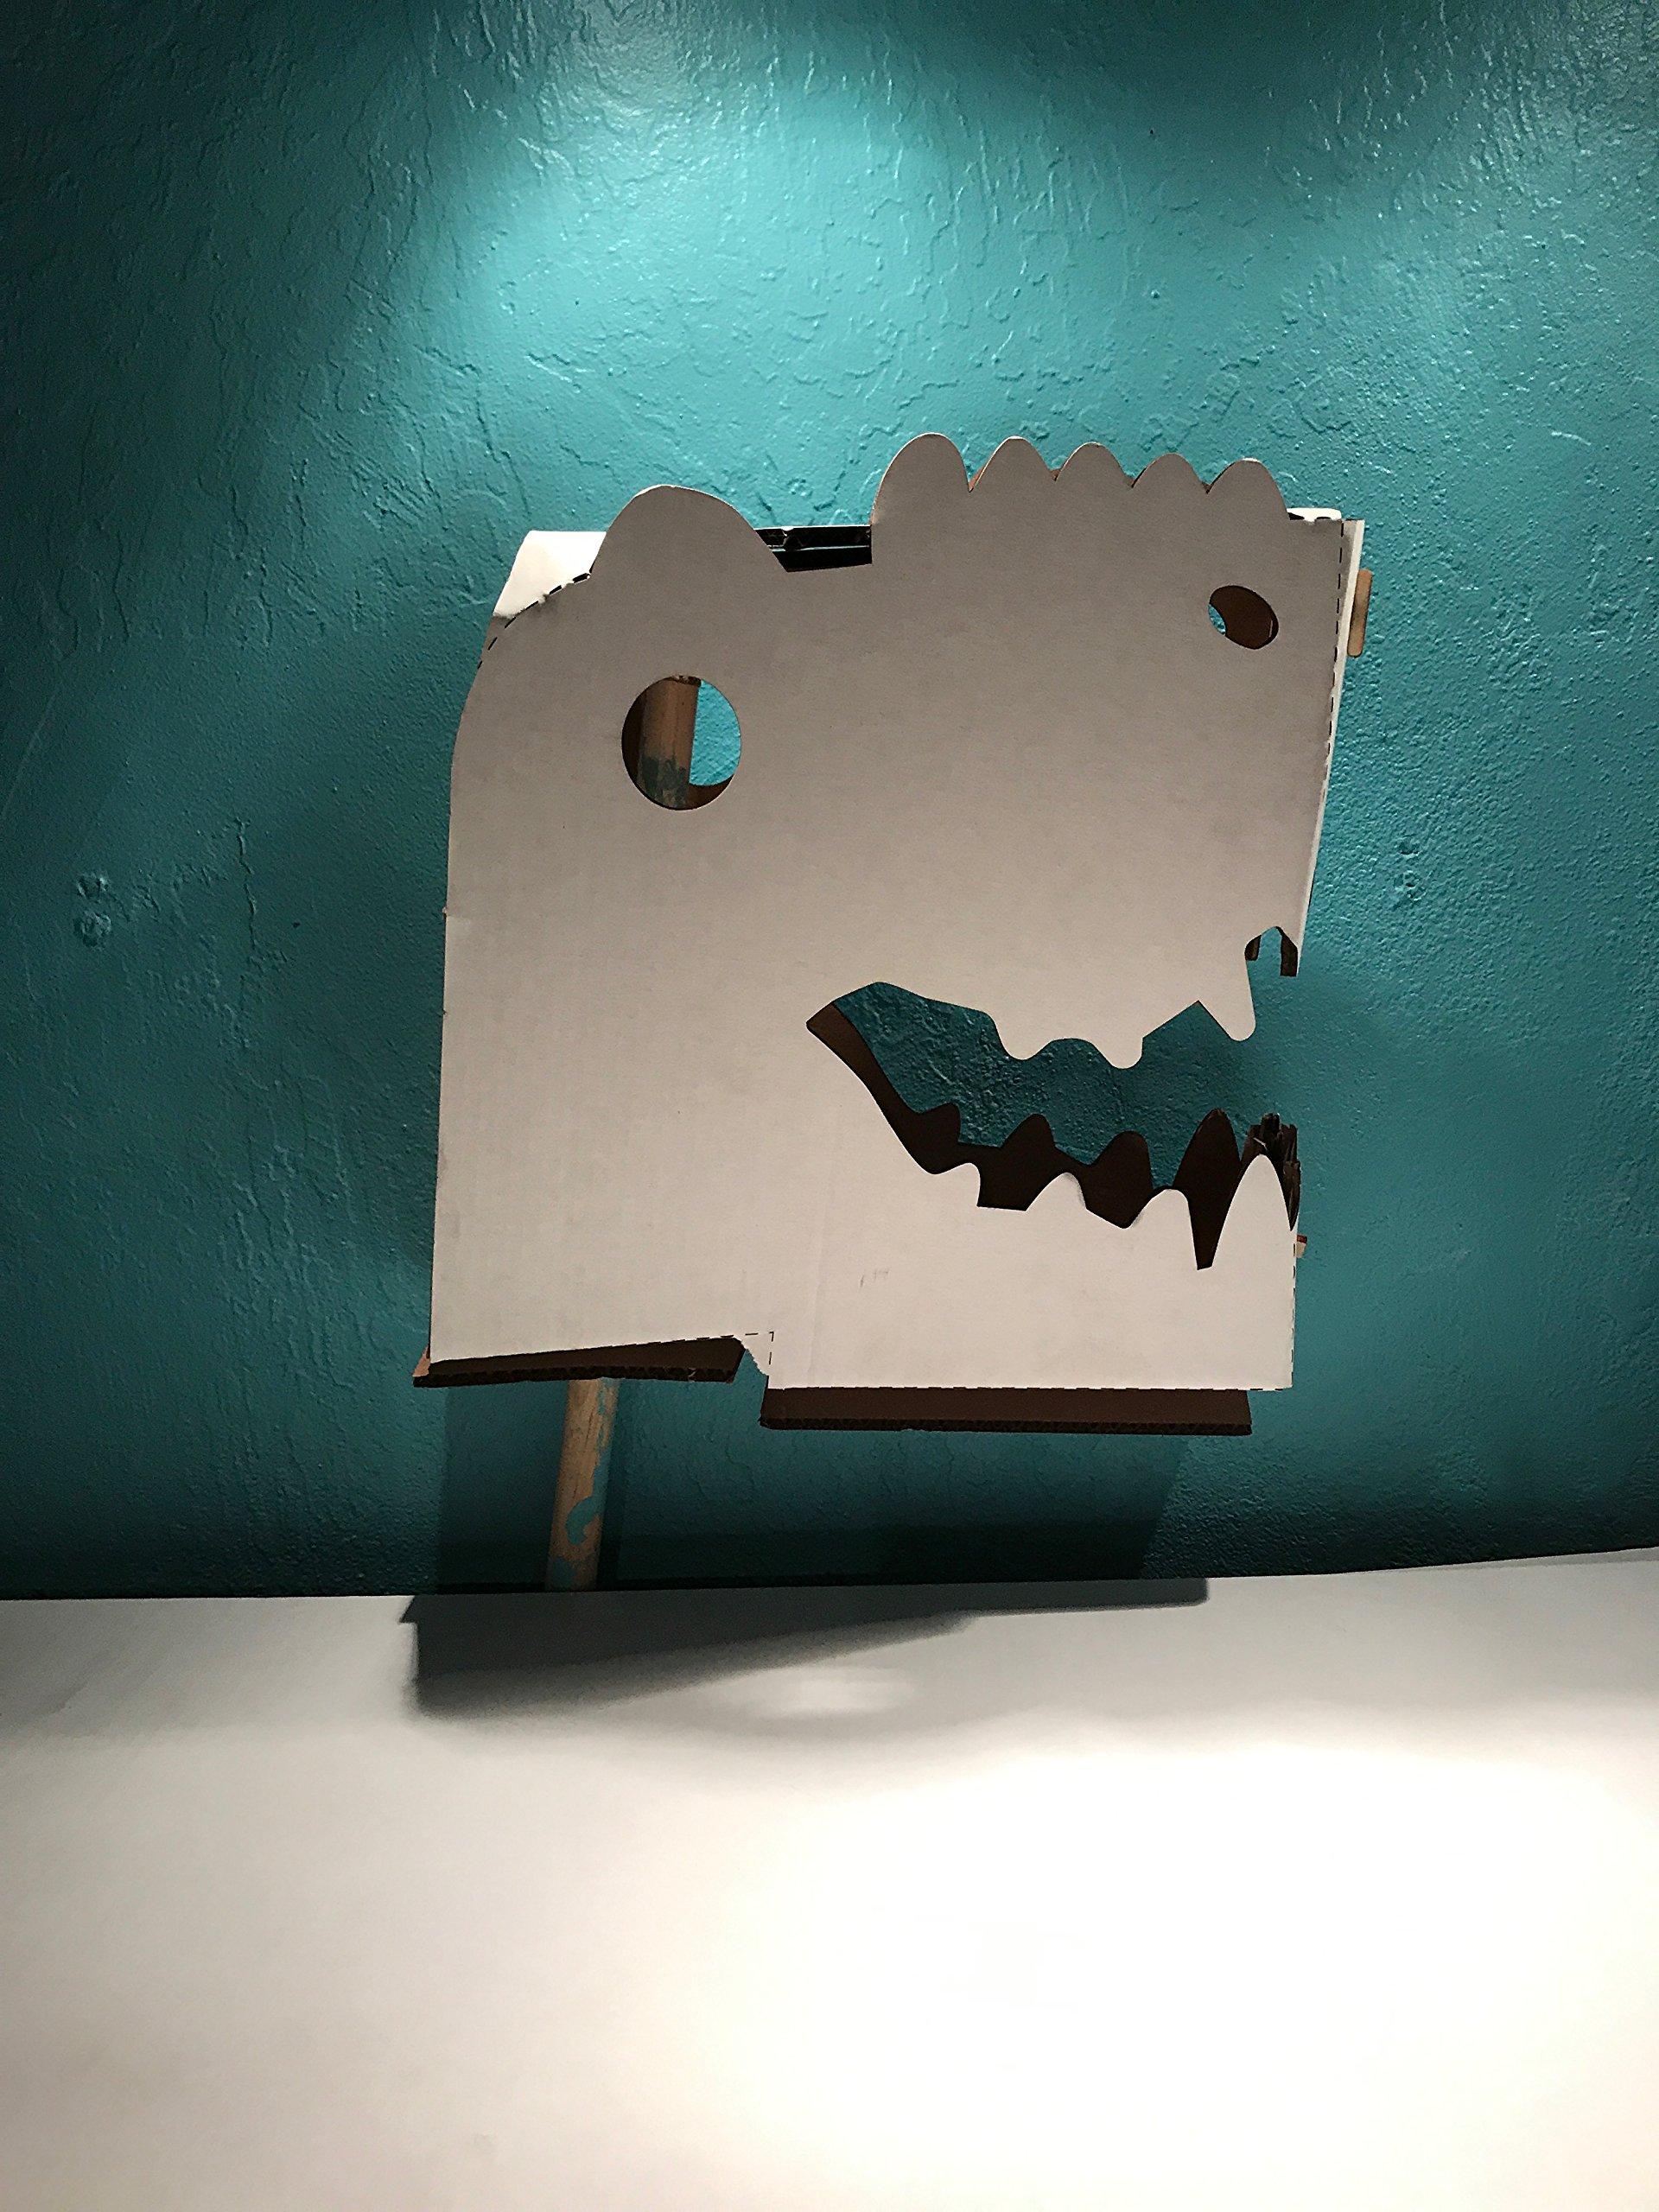 T-REX Dinosaur Toys Gifts for Boys,T-rex Head Stic, Dinosaur Head for Boys